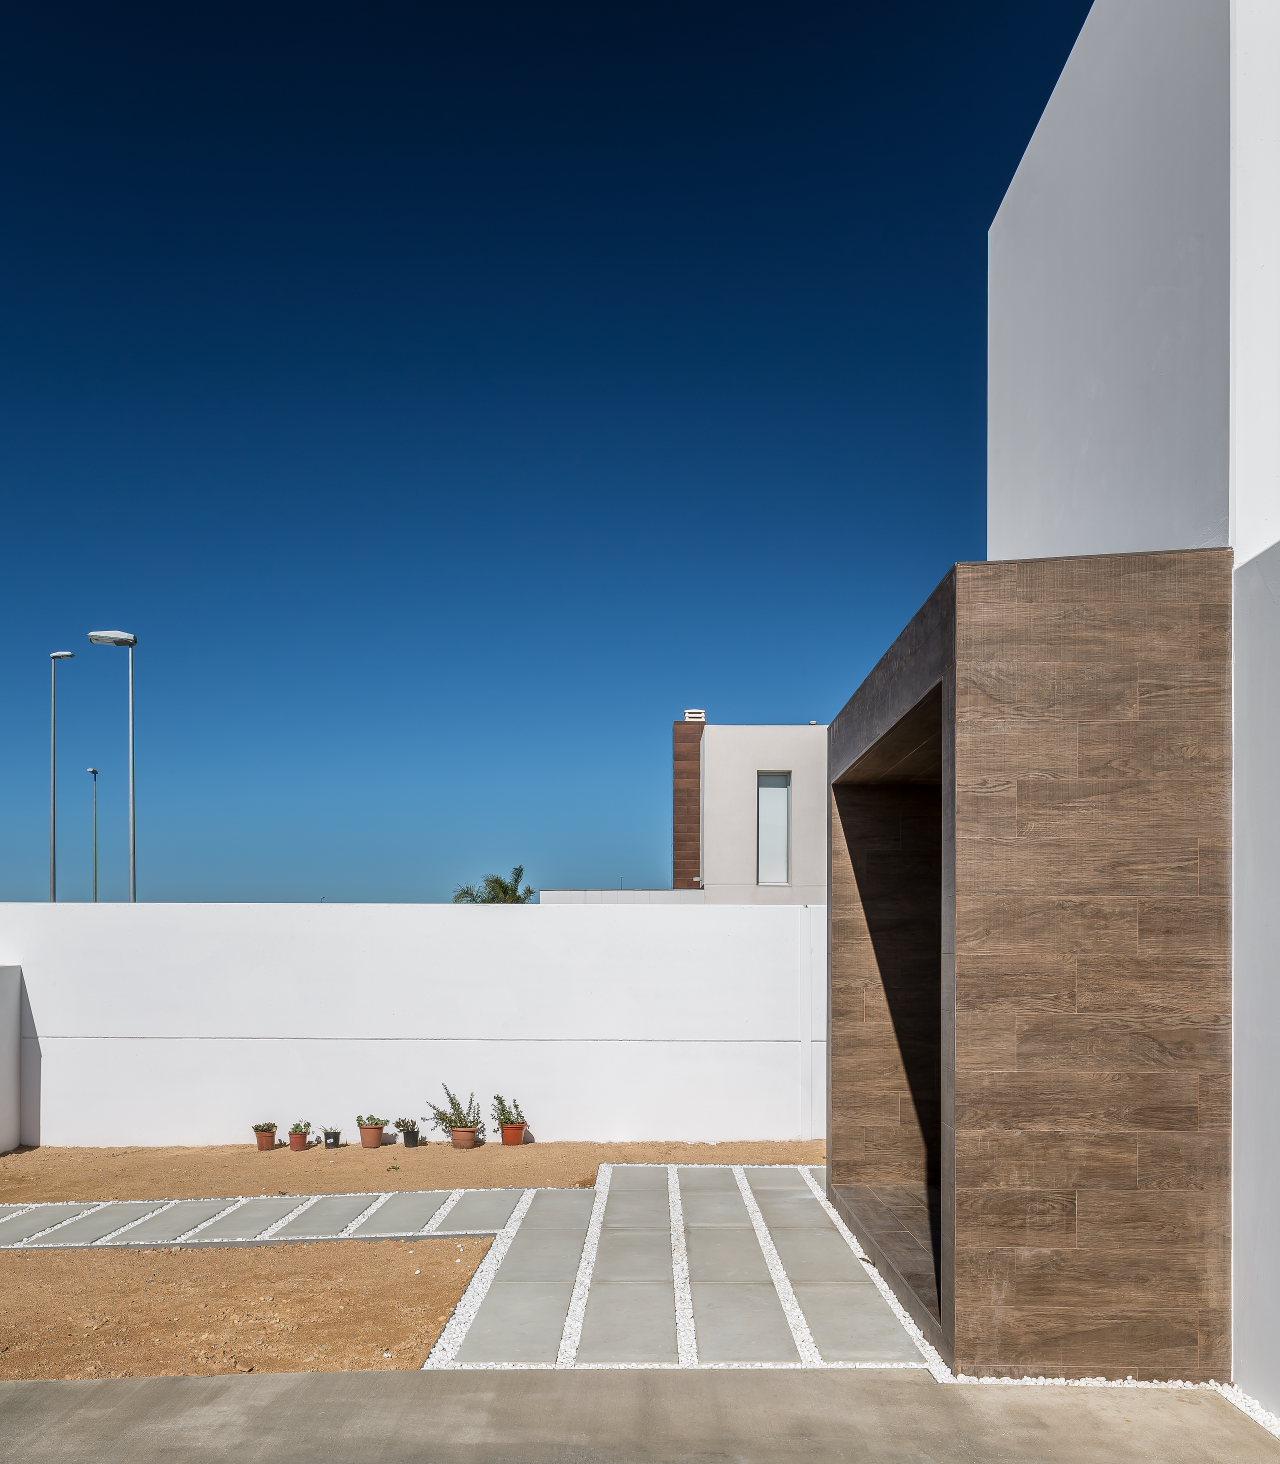 fotografia-arquitectura-valencia-german-cabo-viraje-san-antonio (4)